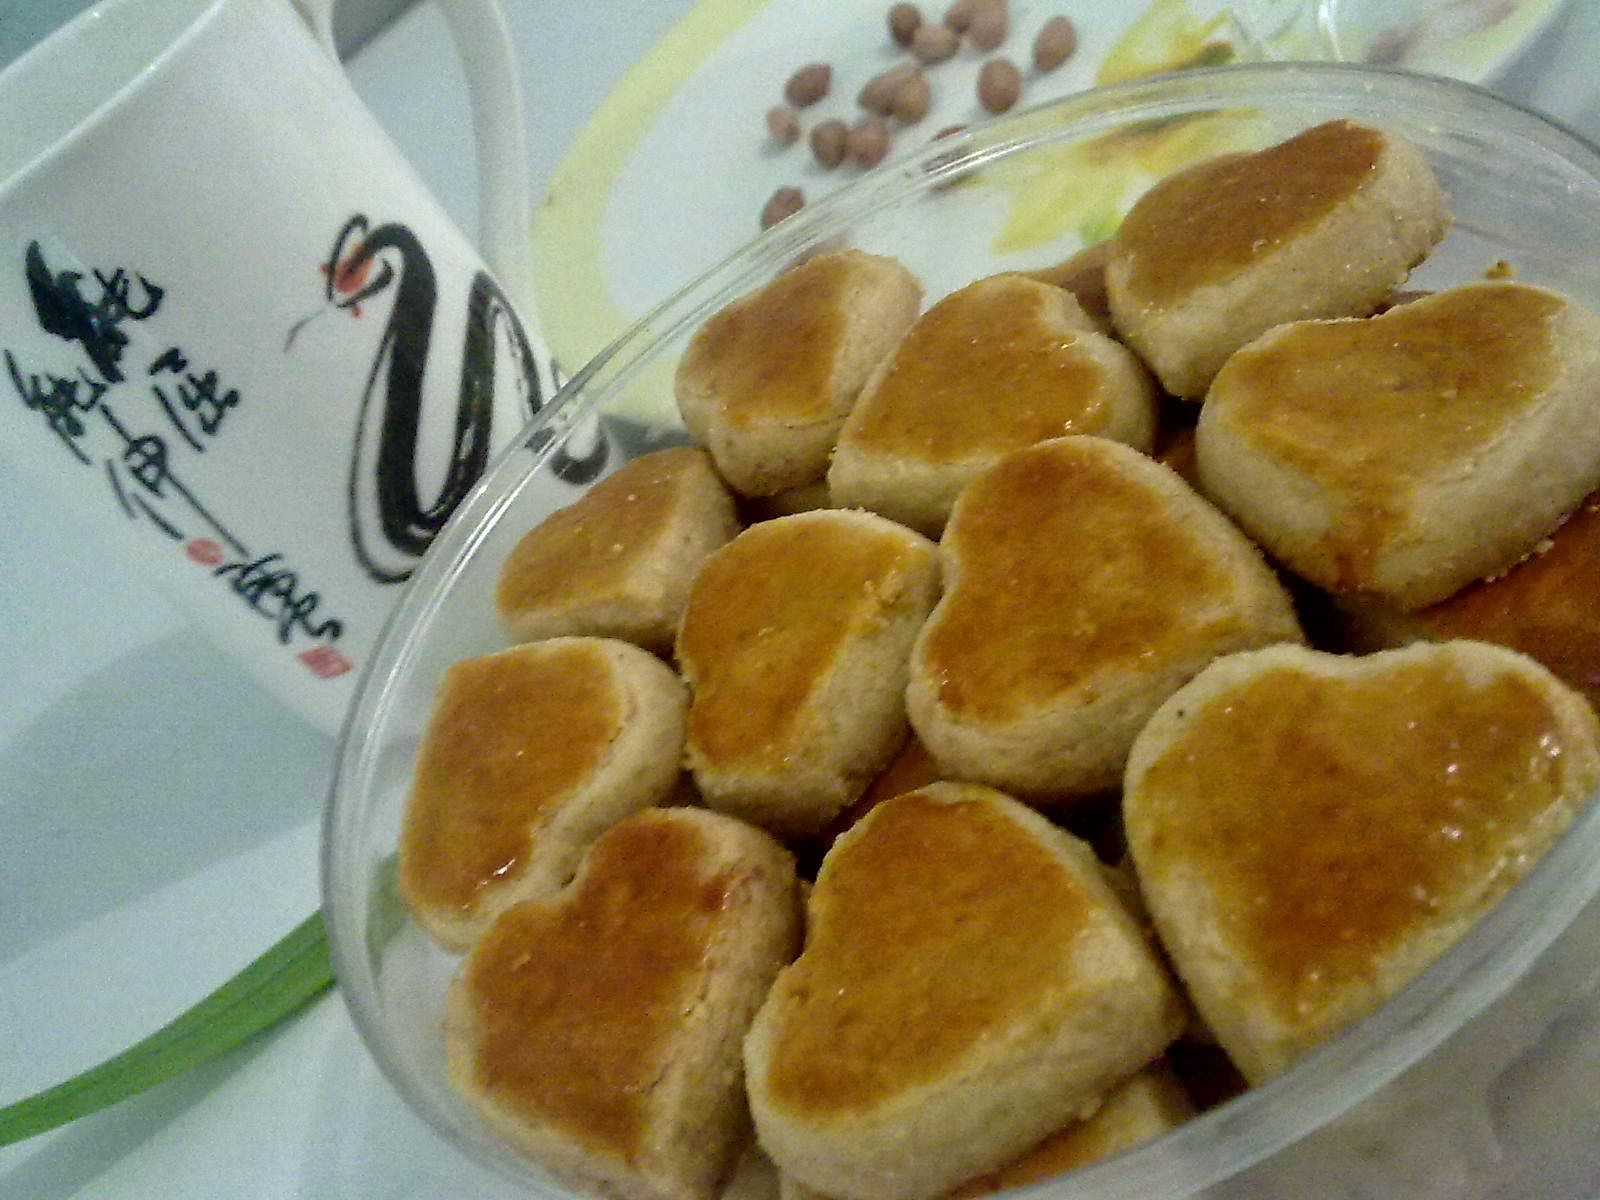 Cara Mudah Membuat Kue Kering Kacang Tanah Untuk Kalian Yang Ingin Membuatnya Sebaiknya Persiapakan Terlebih Dahulu Perlengkapan Dan Kue Kering Makanan Kue